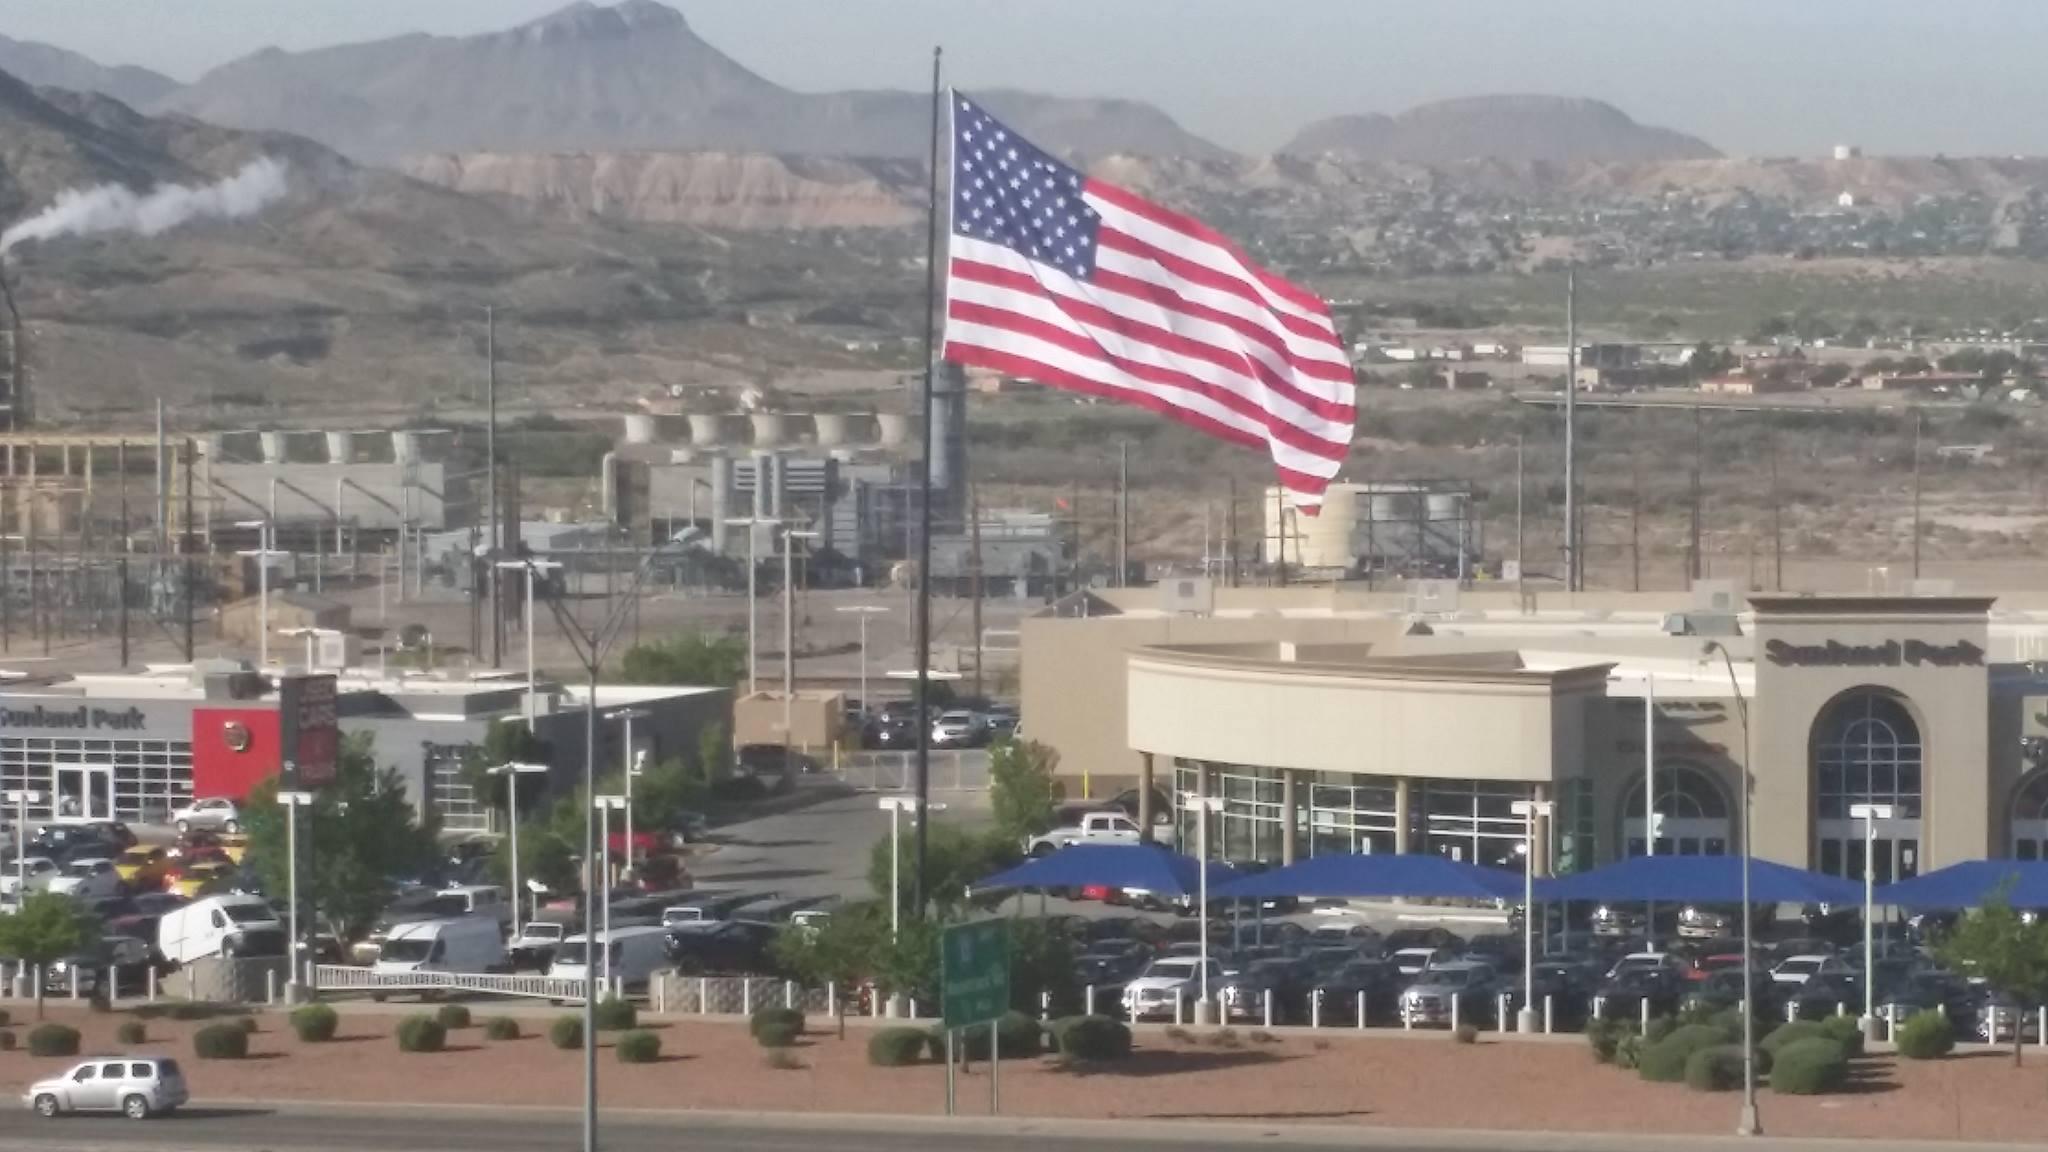 sunland park dodge el paso tx Sunland Park Dodge Chrysler Jeep Ram 2 Crockett St, El Paso, TX